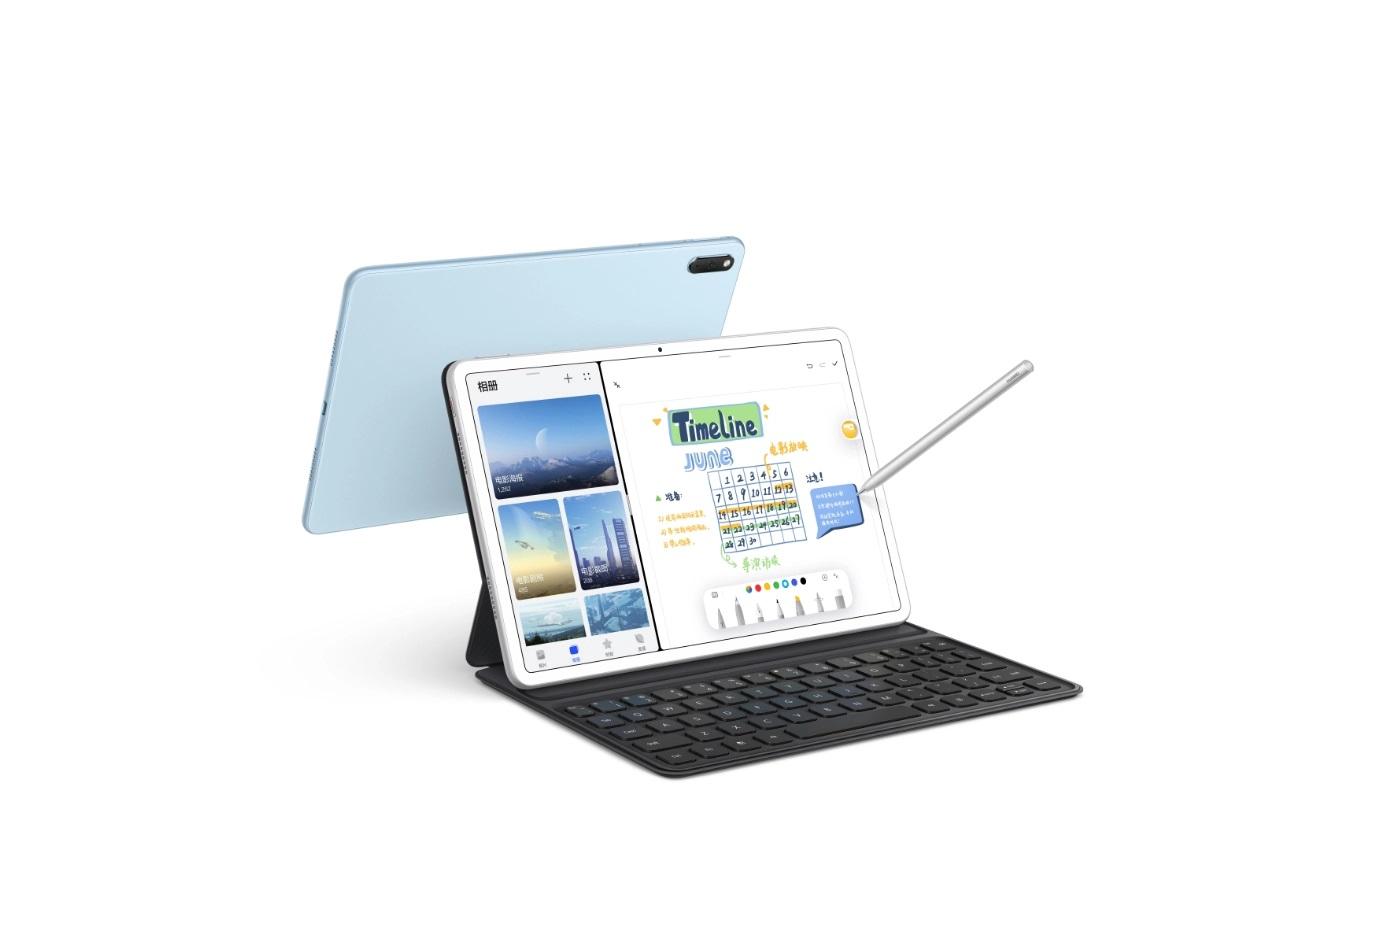 Huawei MatePad 11 tablet